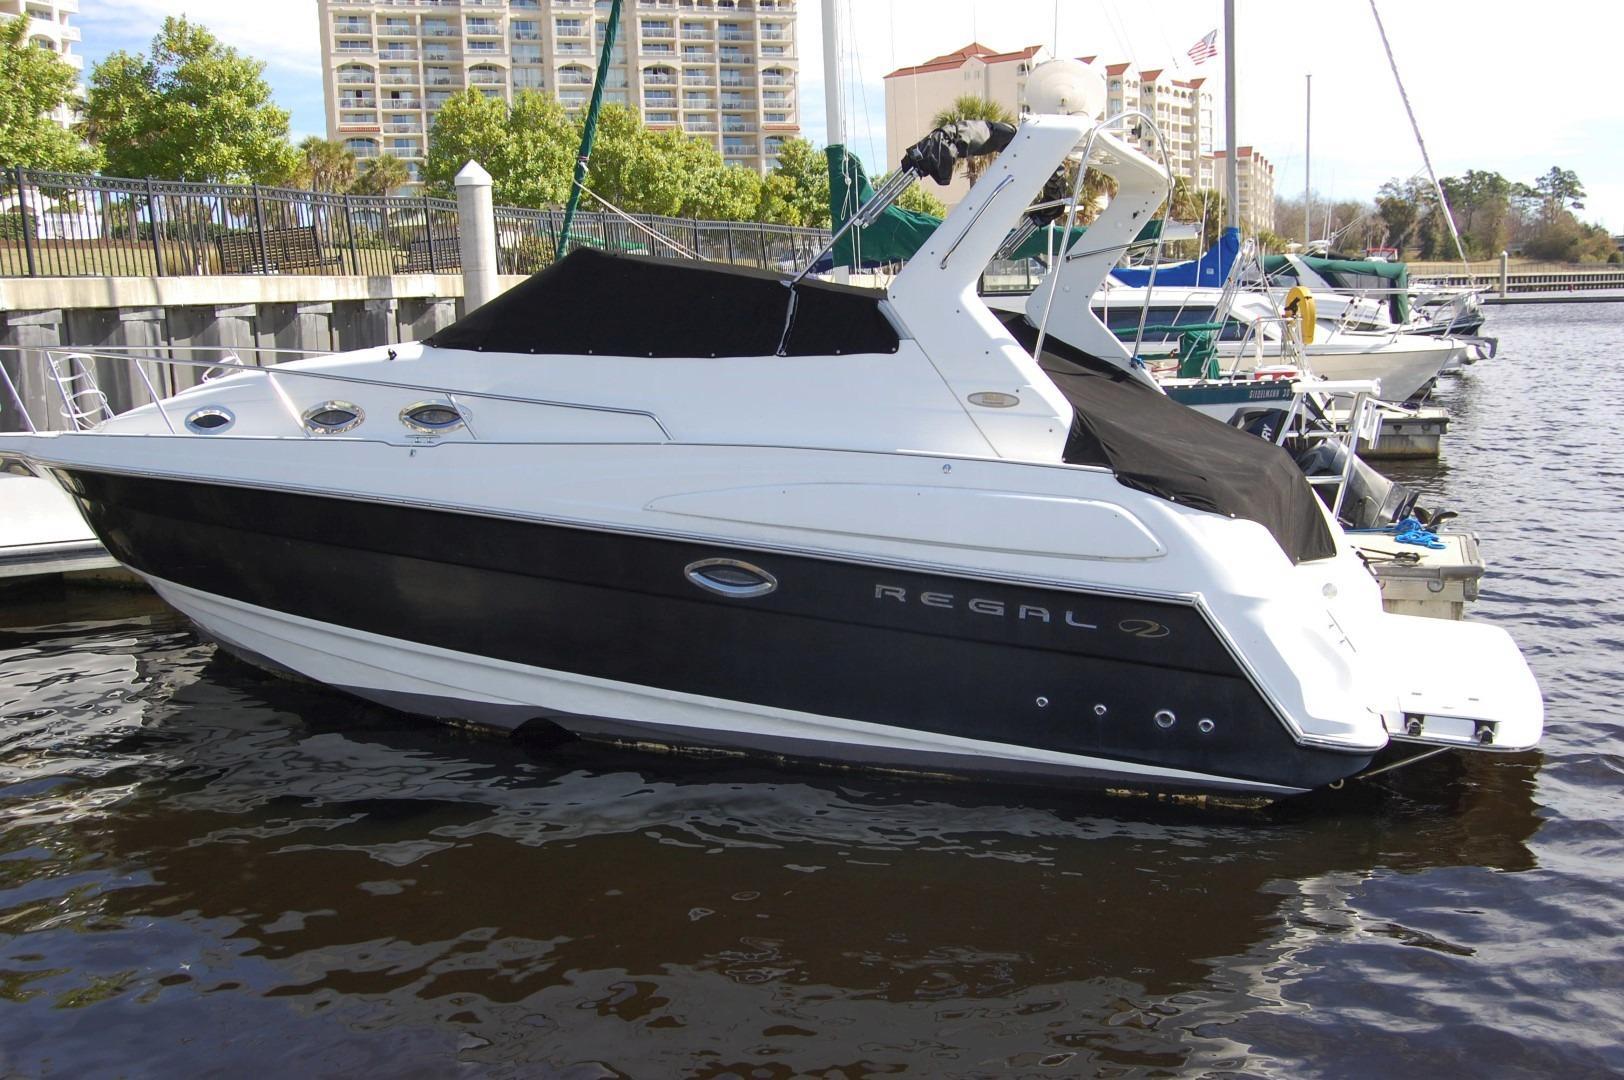 North Myrtle Beach Boat Sales